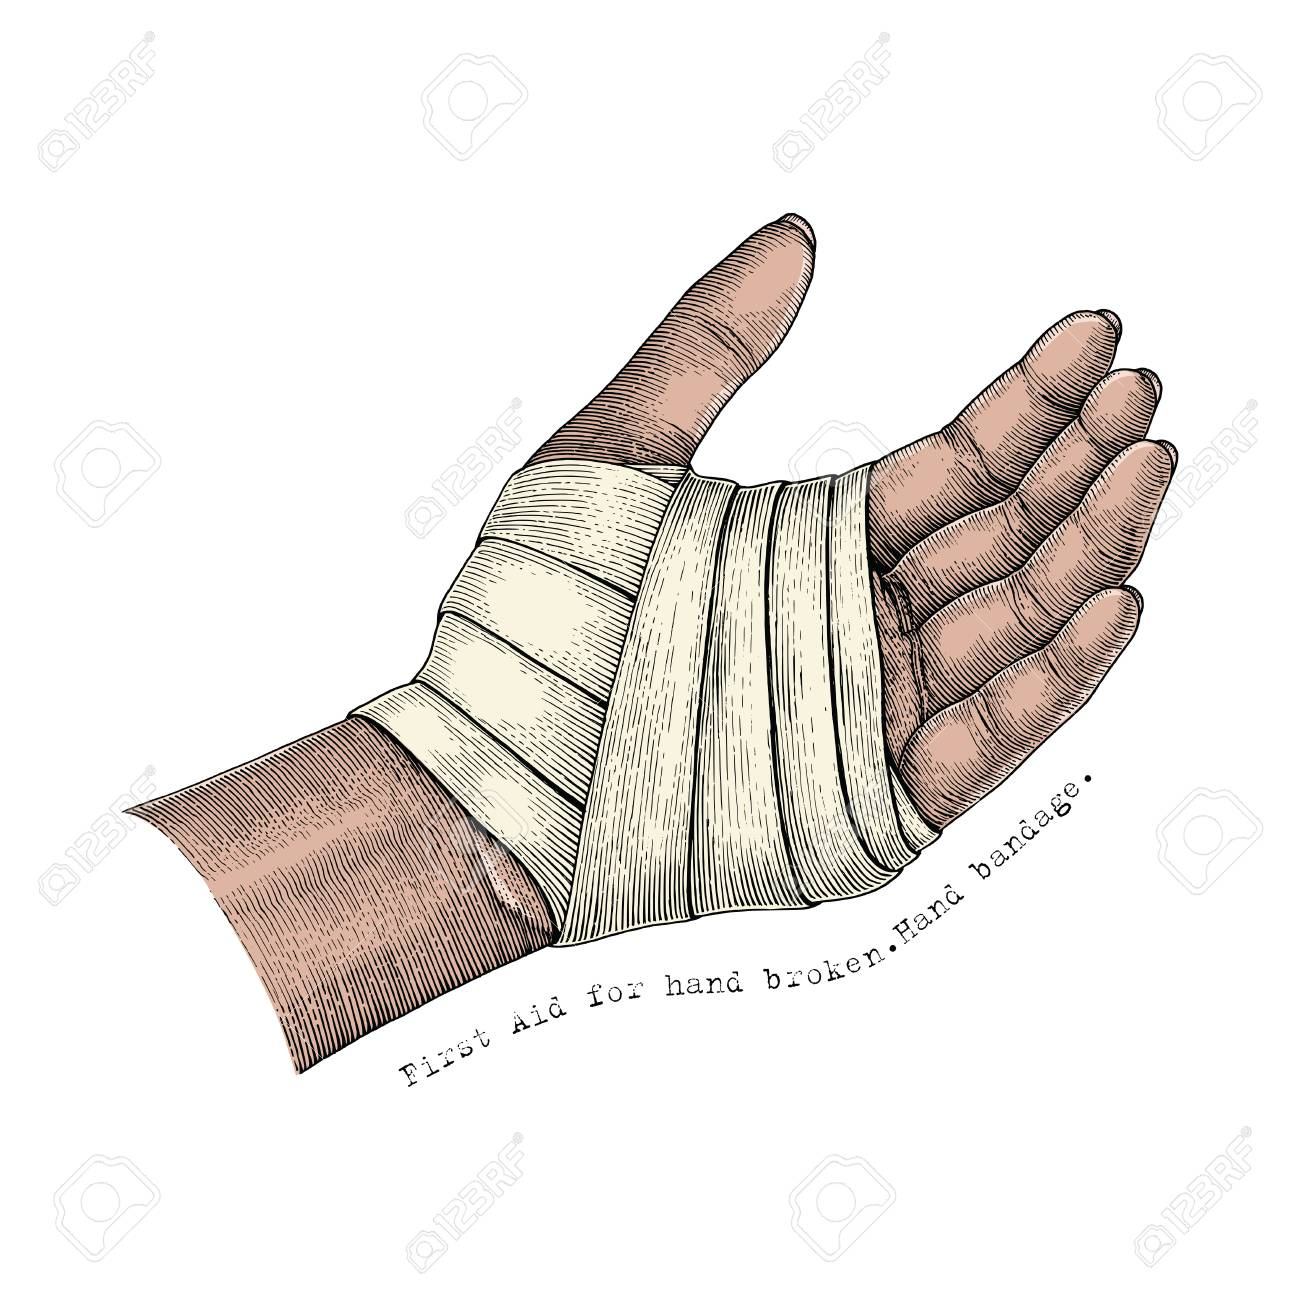 First Aid for hand broken.Hand bandage.Hand illustration vintage...